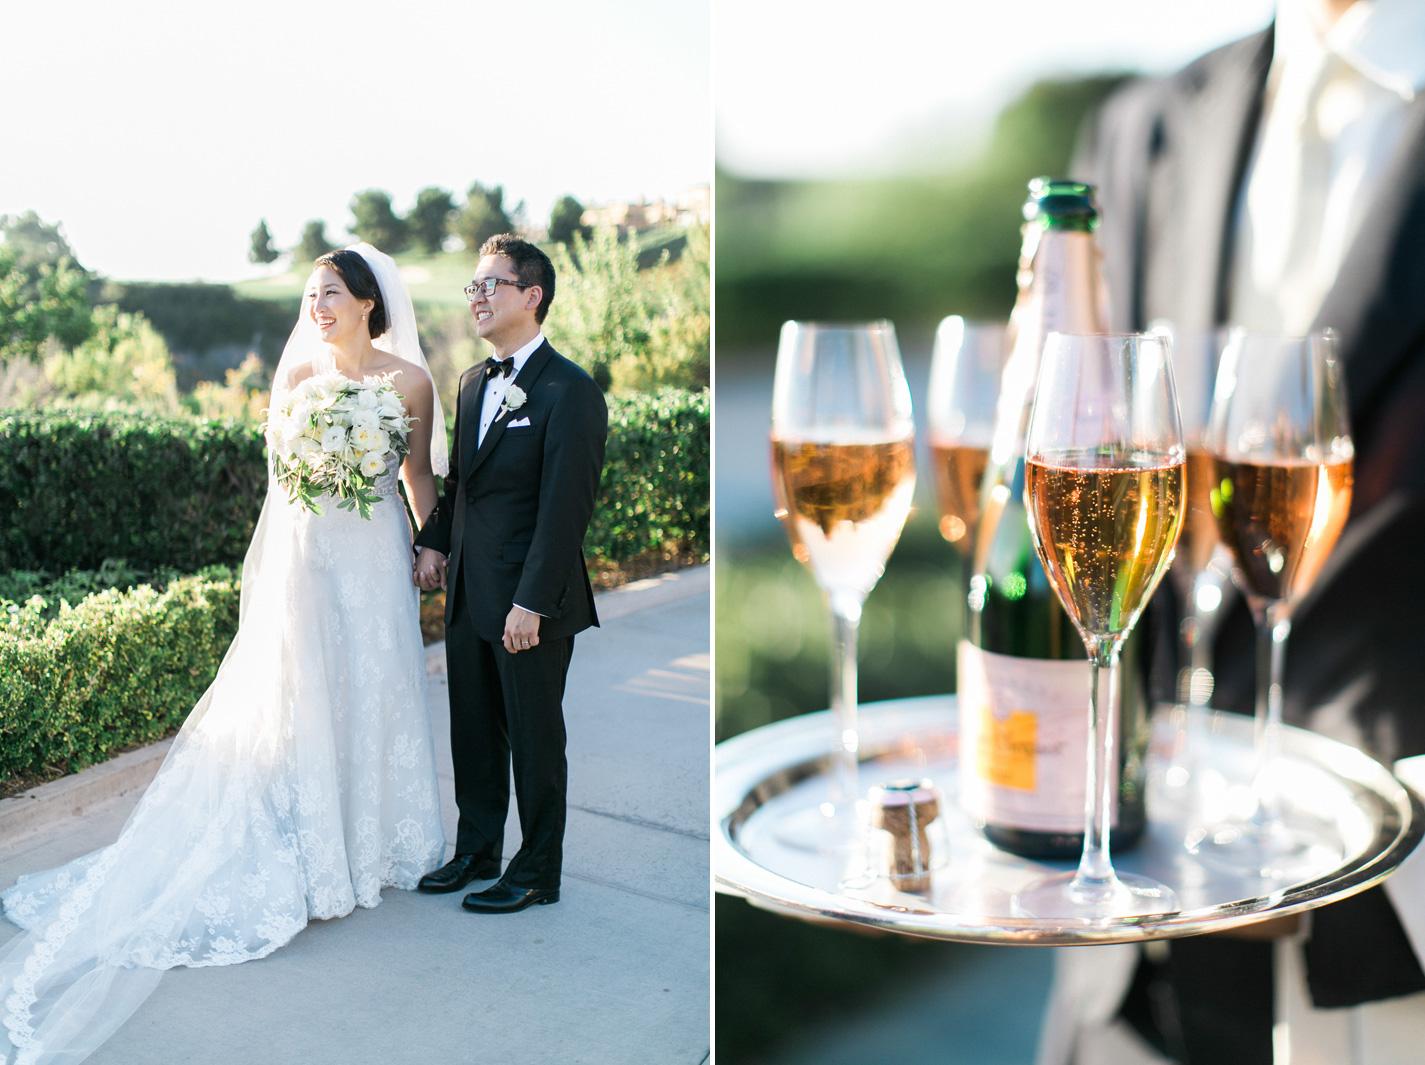 Pelican-hill-wedding-21